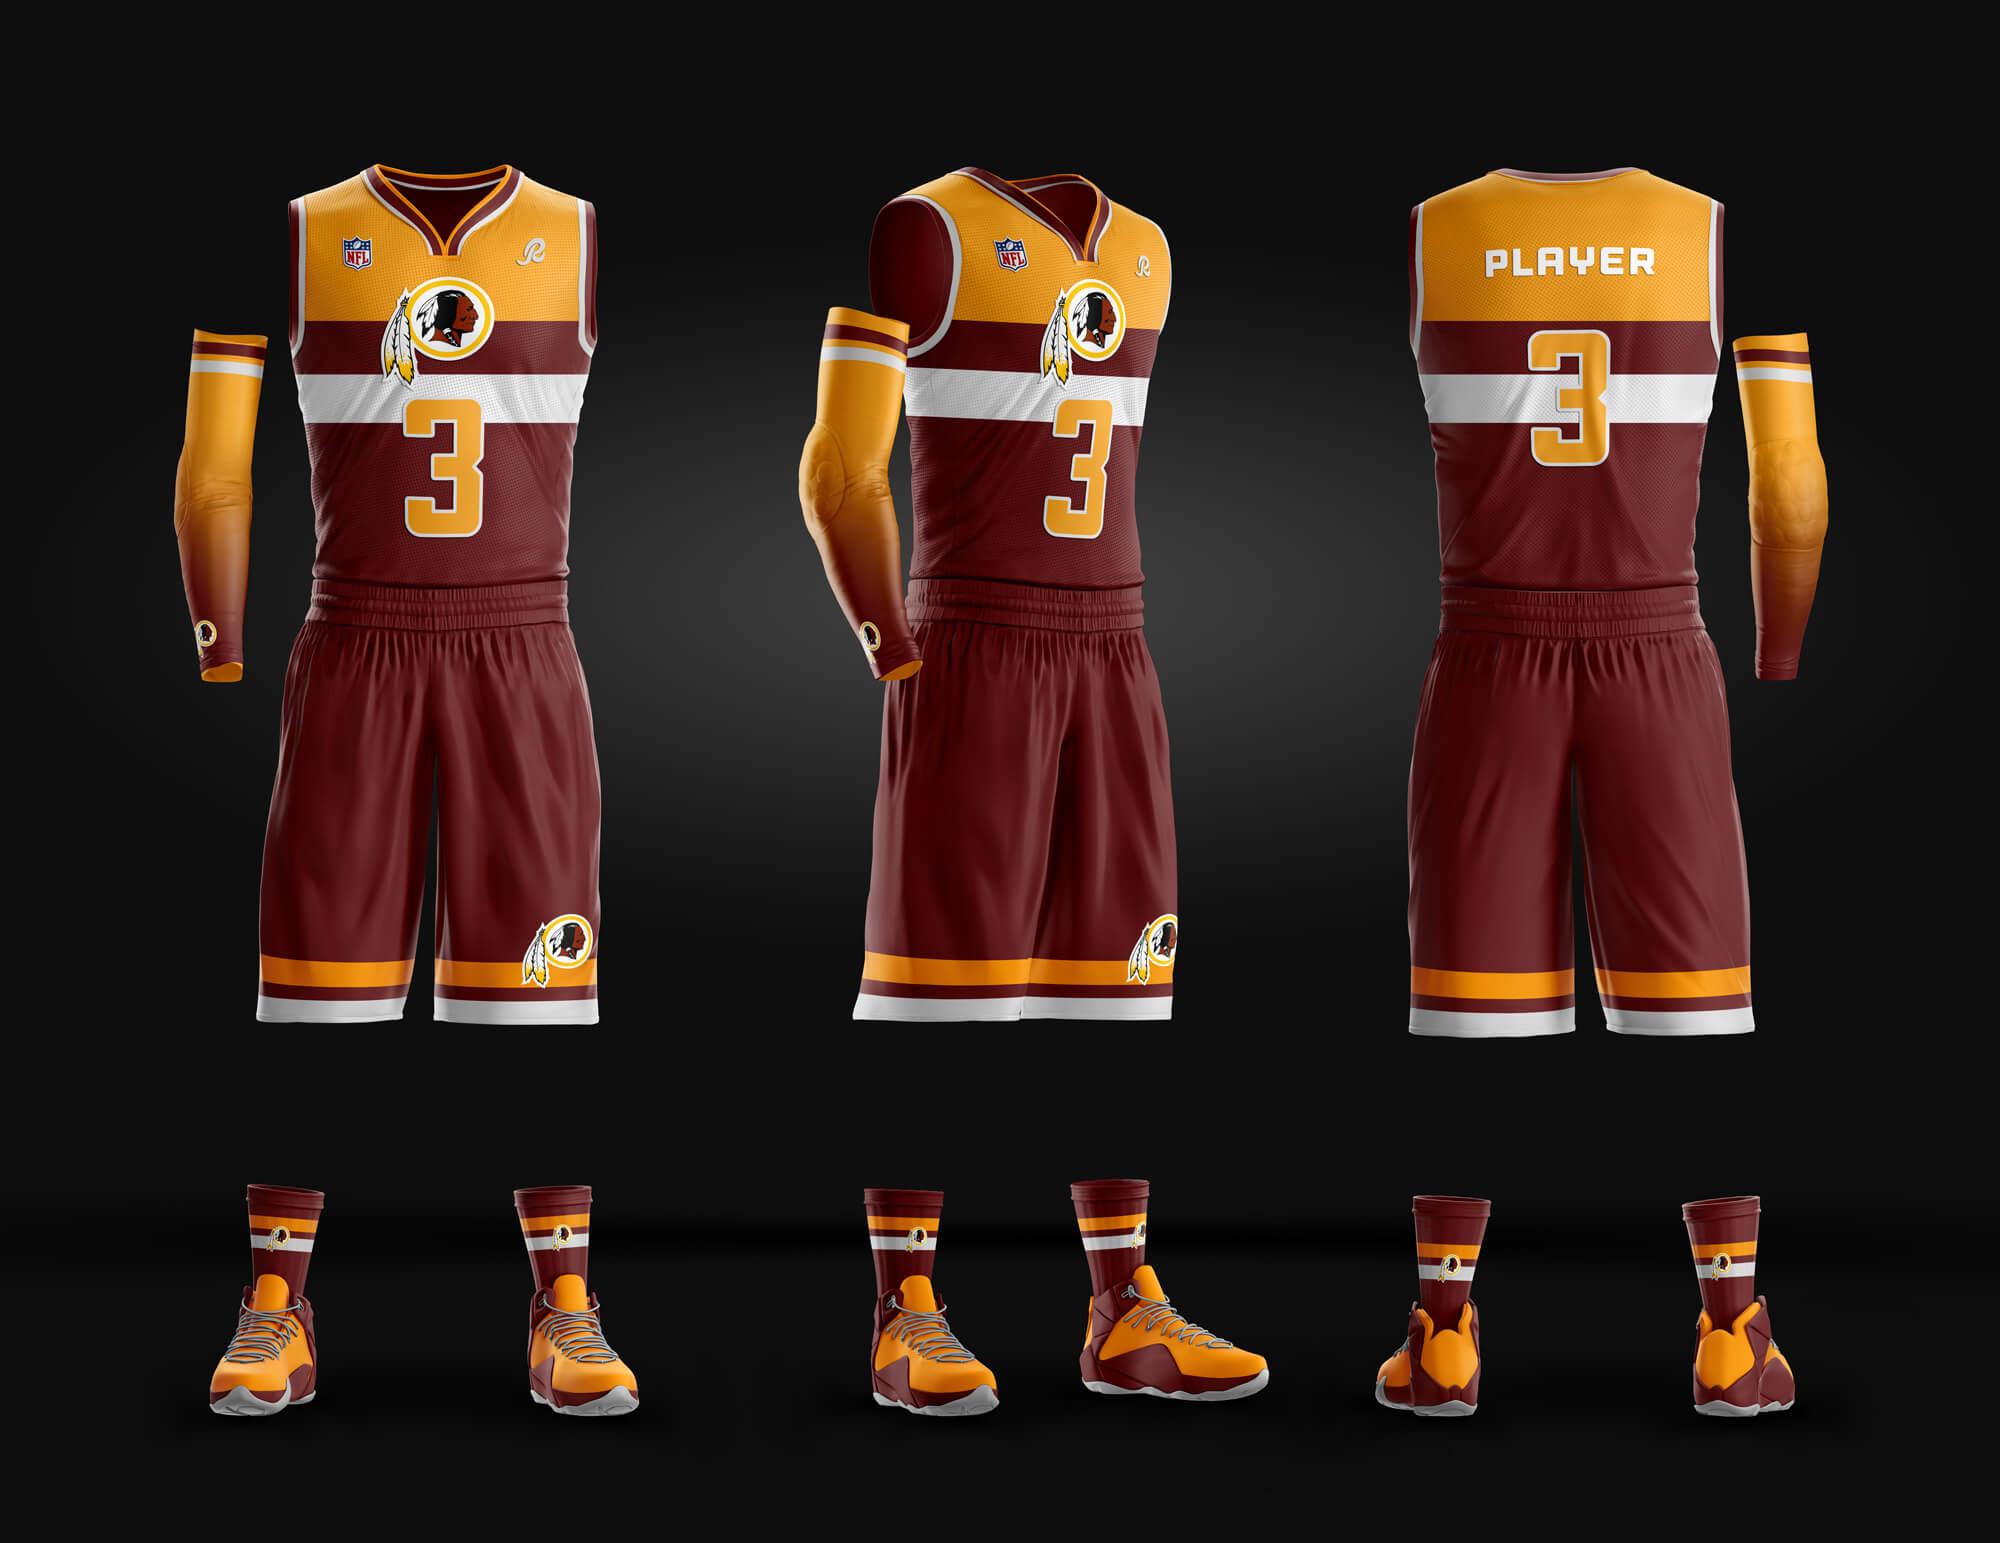 Basketball Uniform Design Software